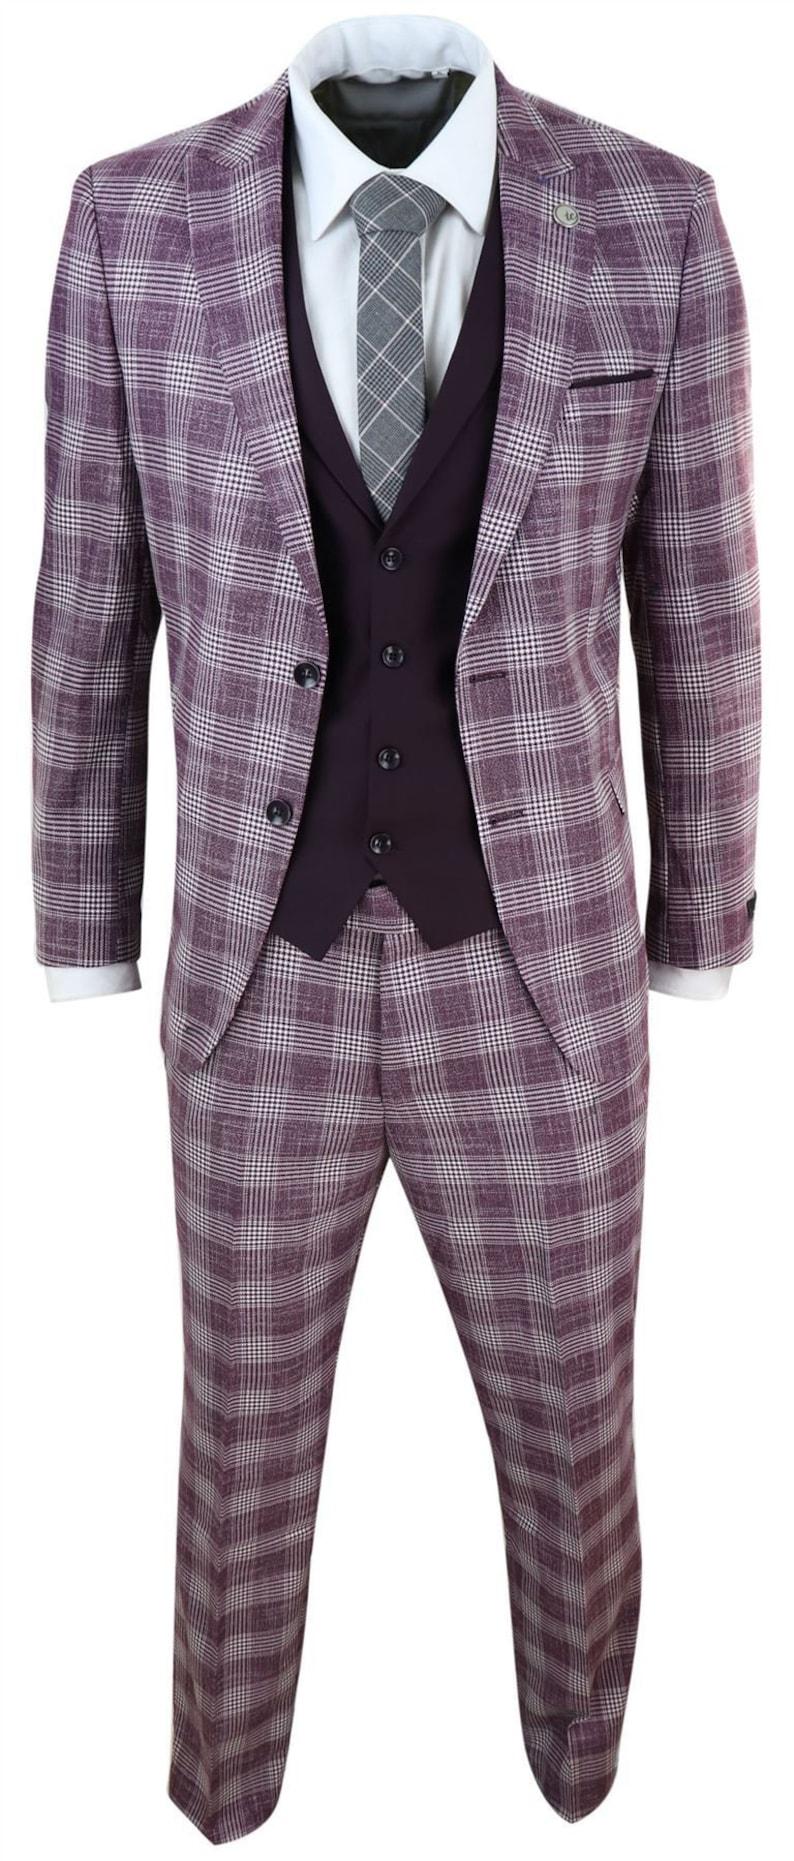 1960s Mens Suits | Mod, Skinny, Nehru     Mens 3 piece suit check herringbone tweed vintage burgundy classic wedding prom $173.12 AT vintagedancer.com